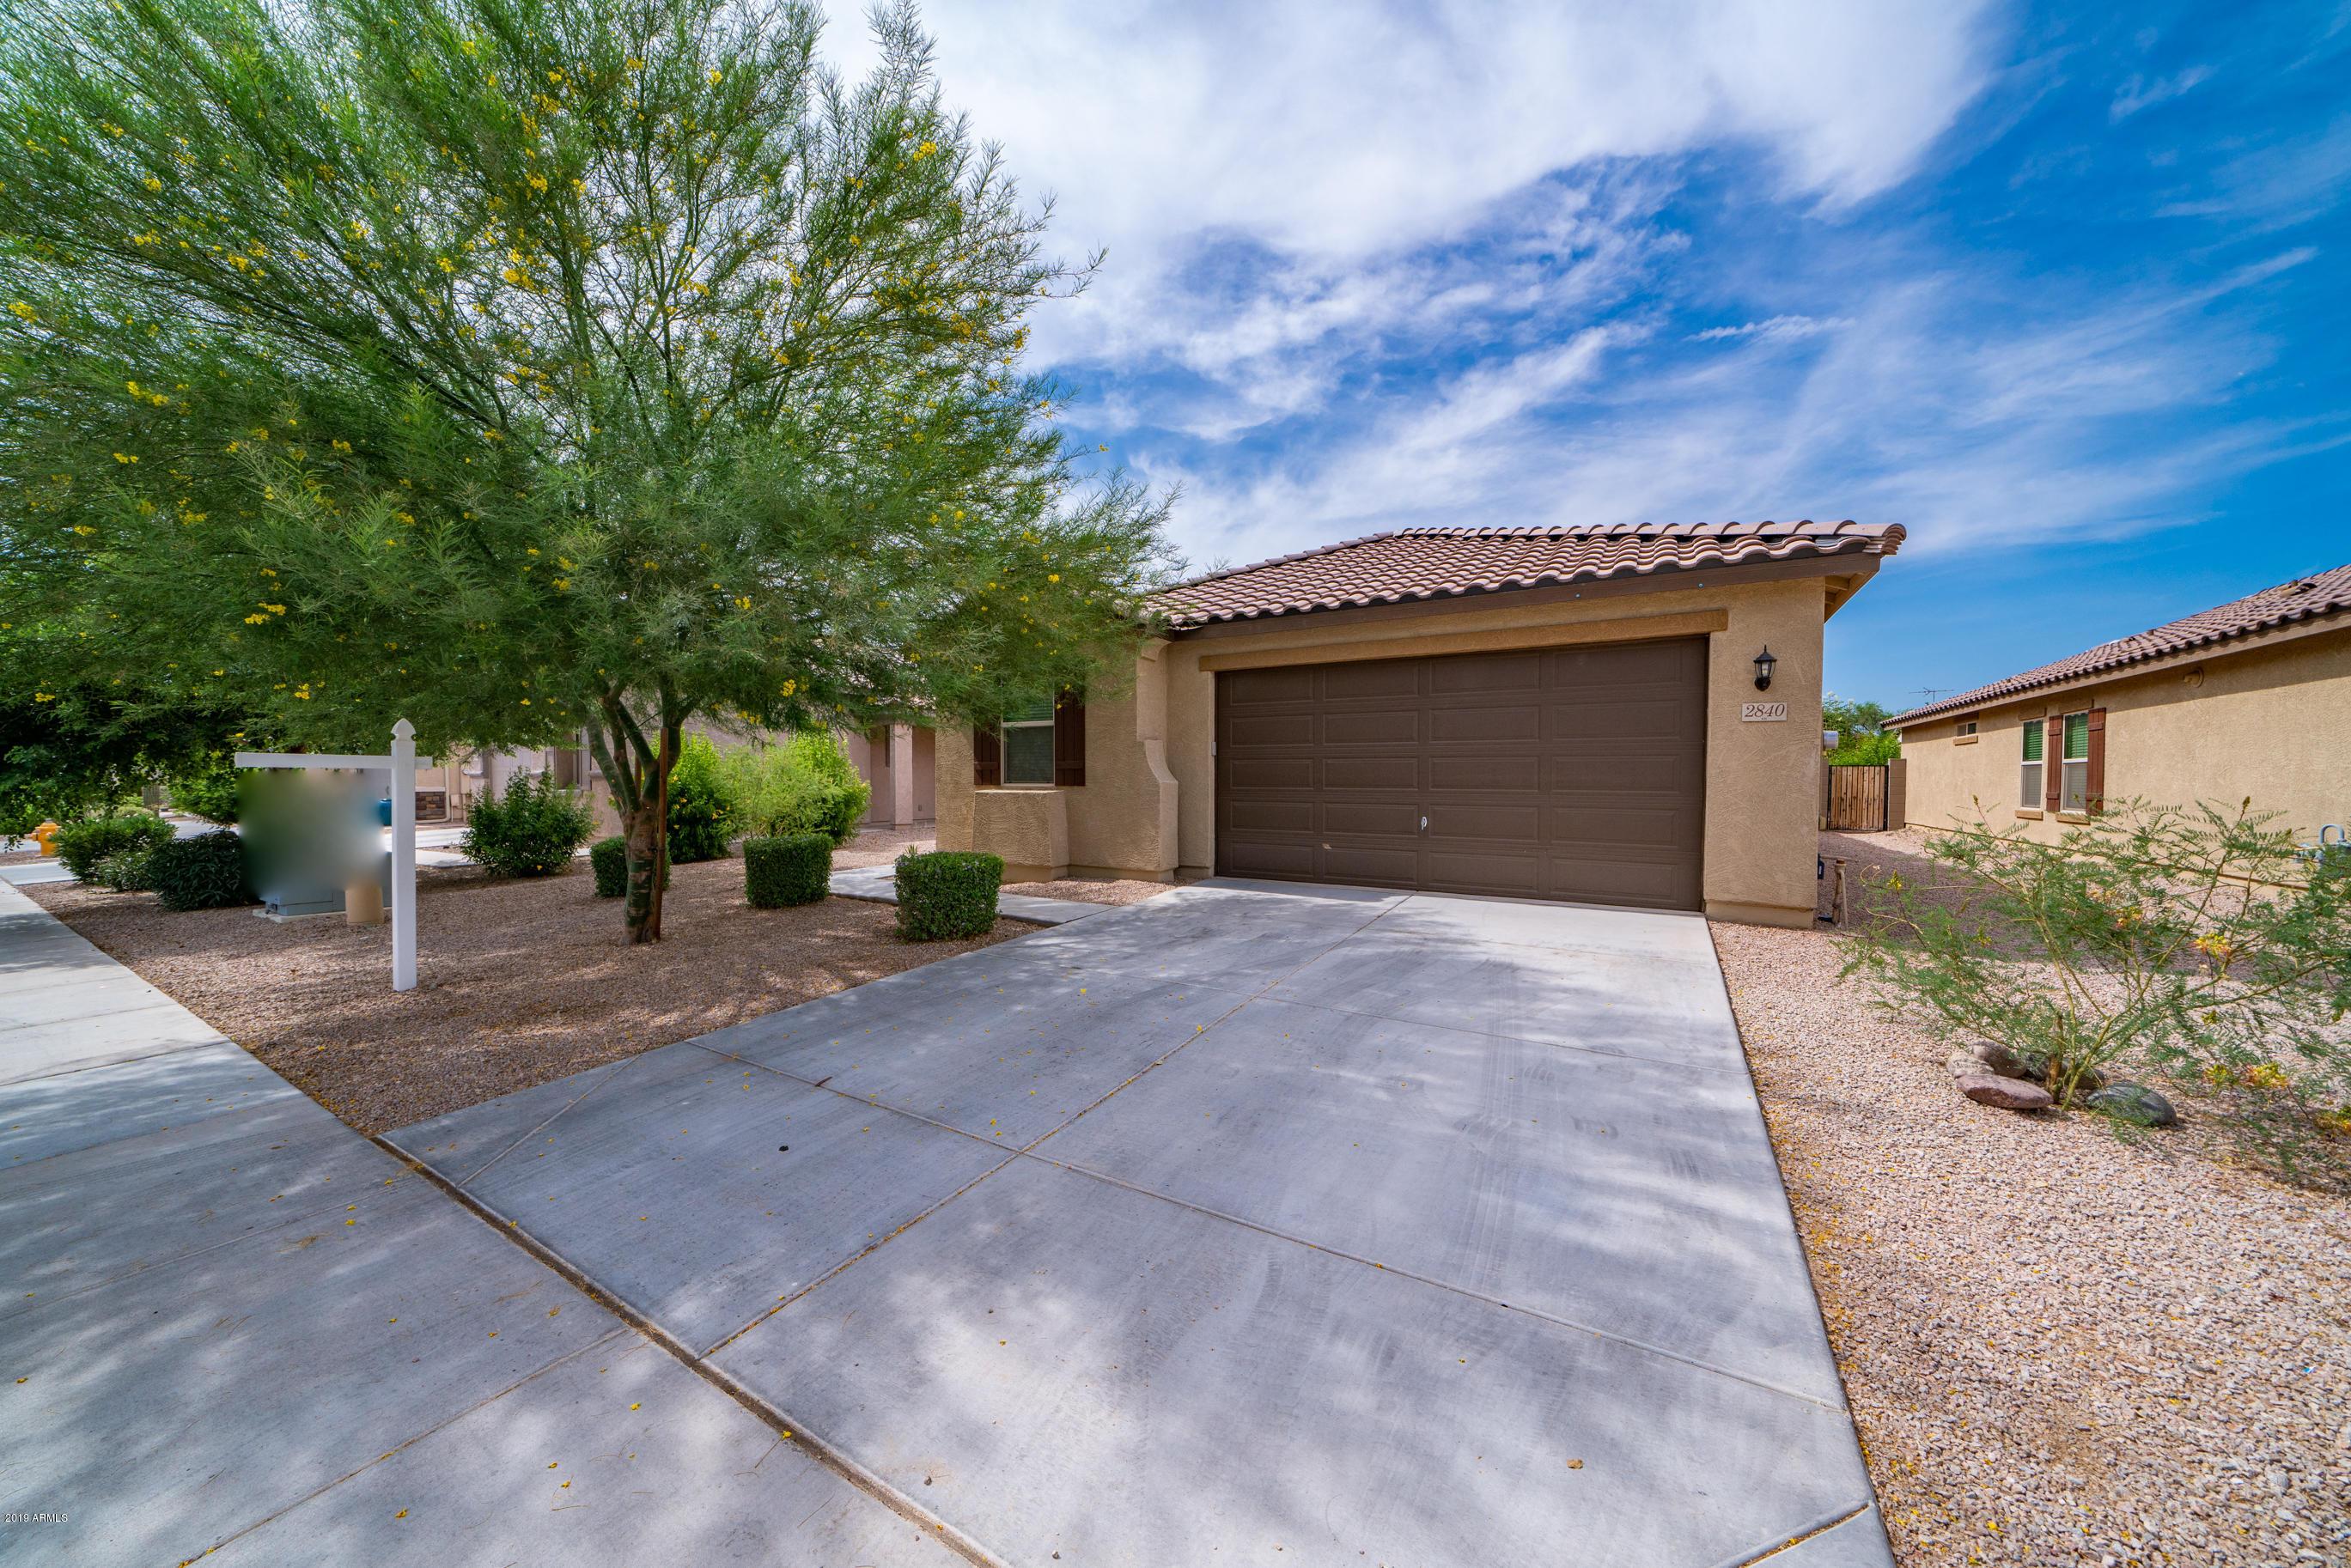 Photo of 2840 E DETROIT Street, Chandler, AZ 85225